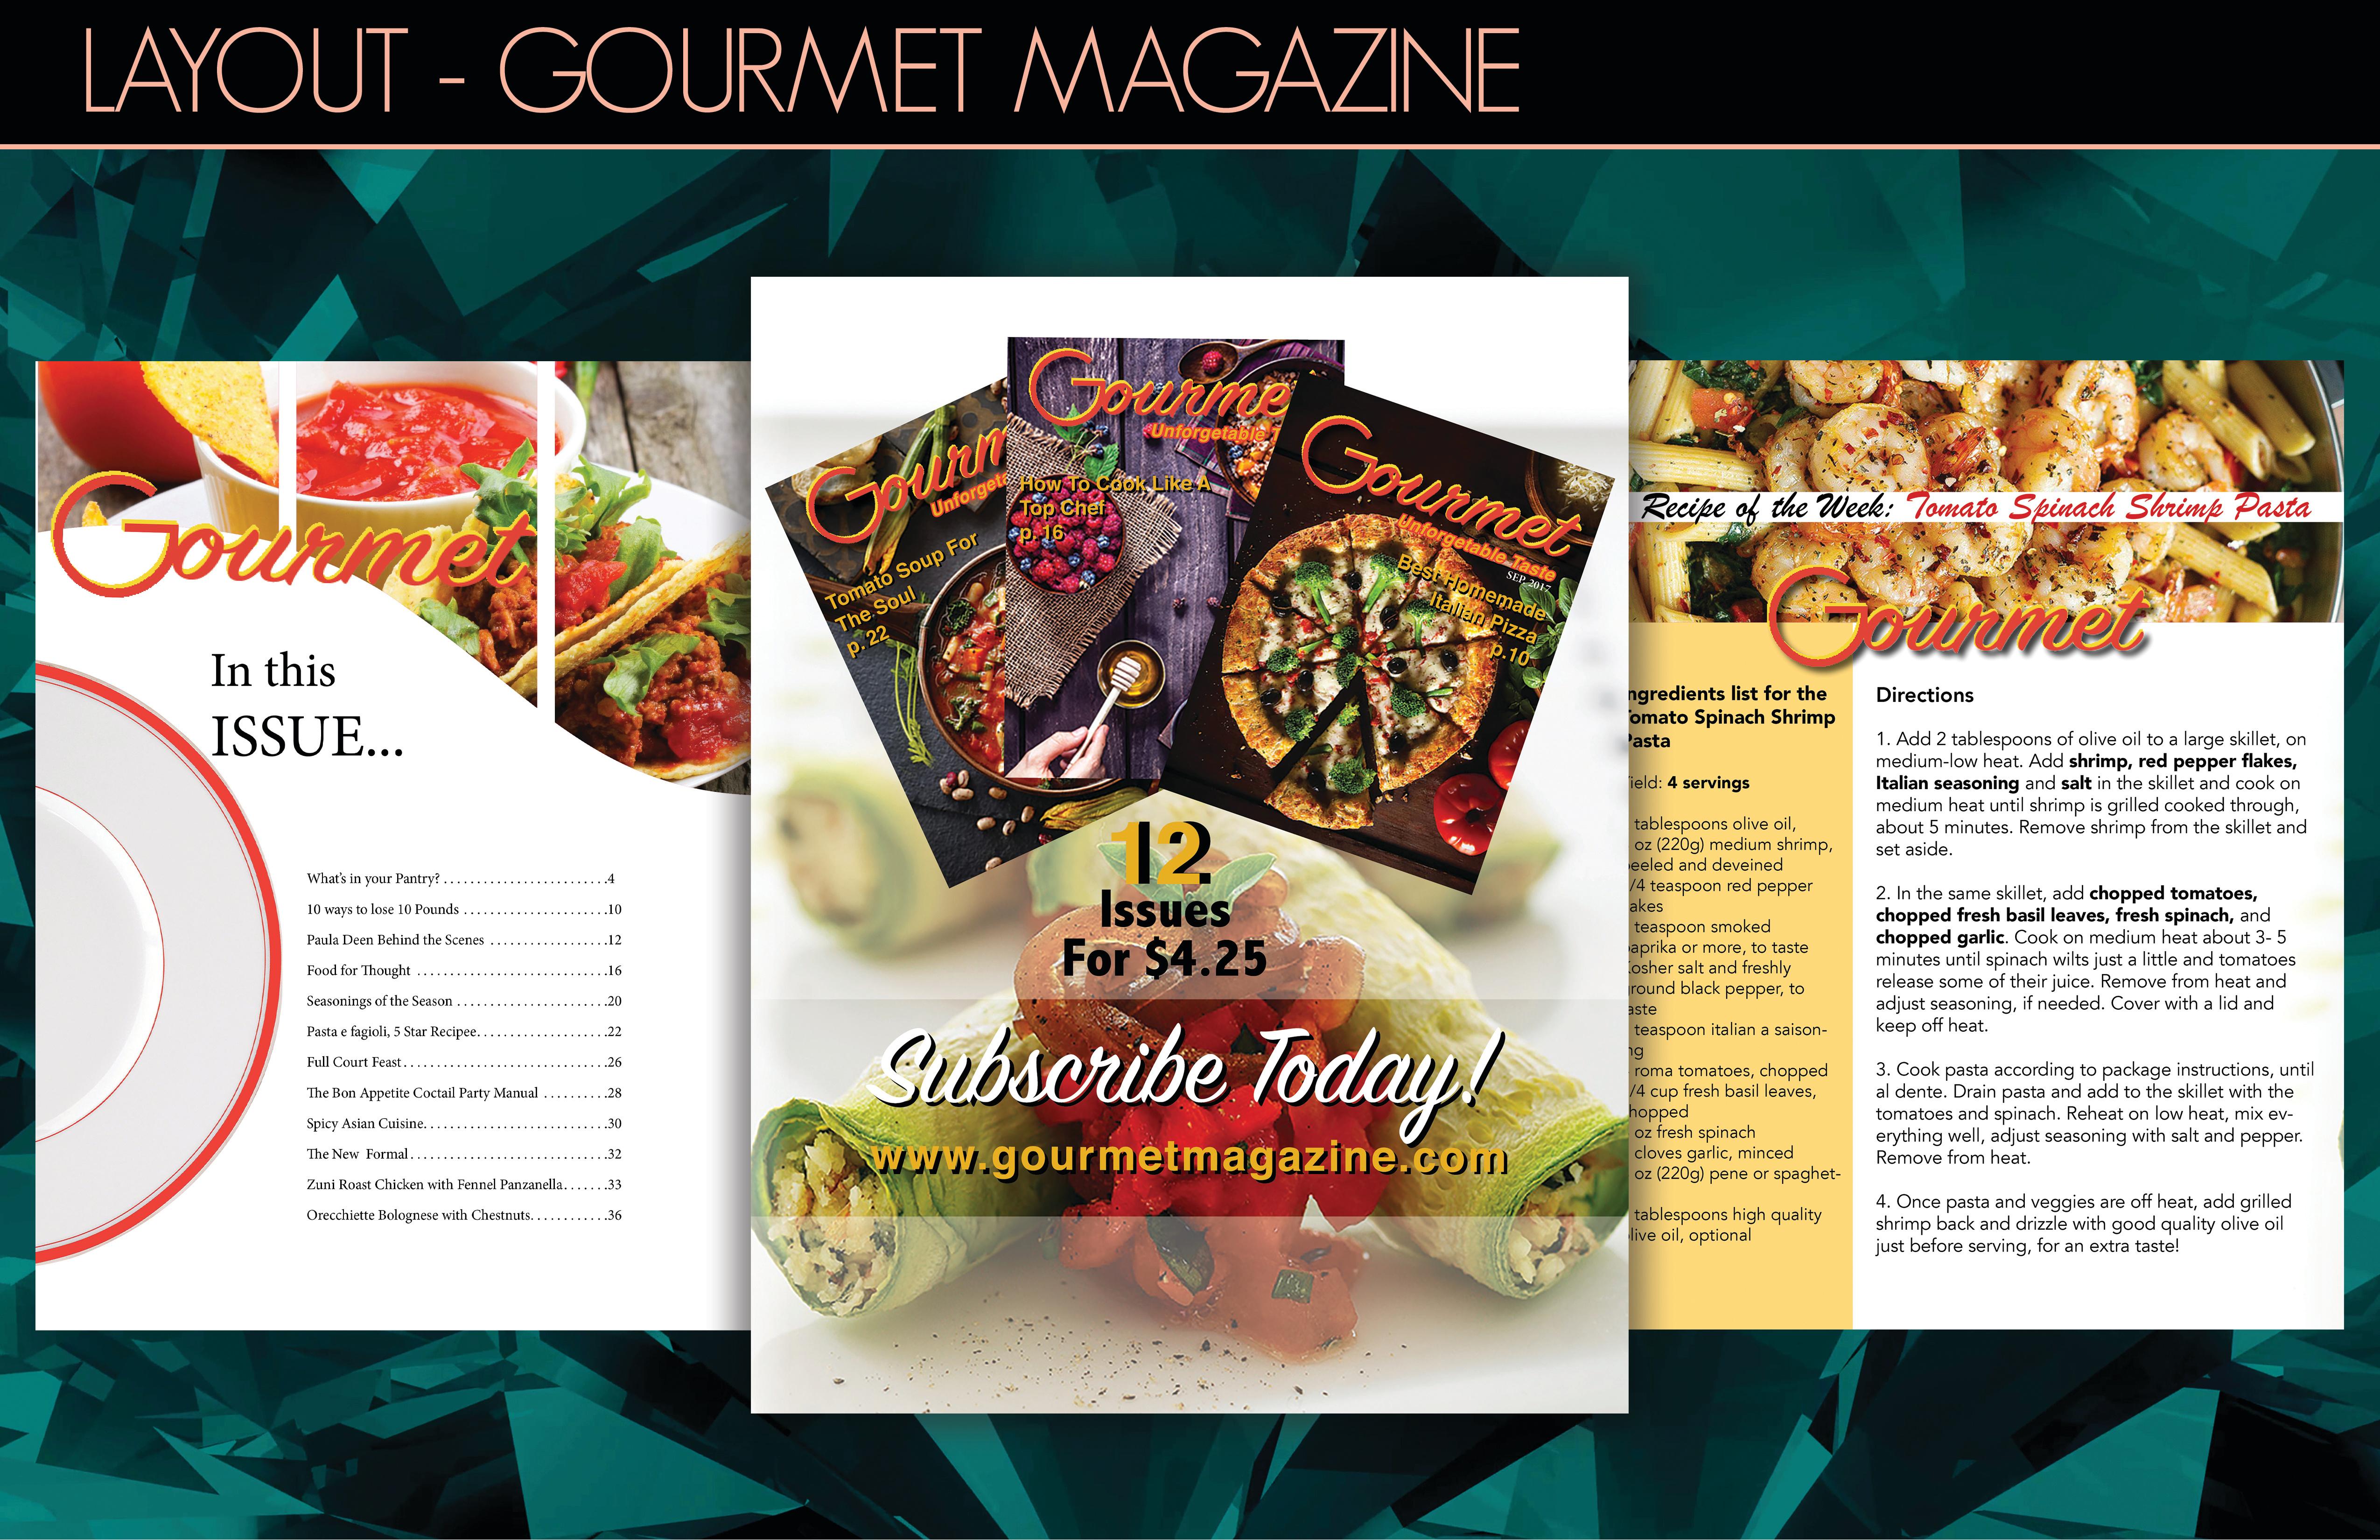 Gourmet magazine